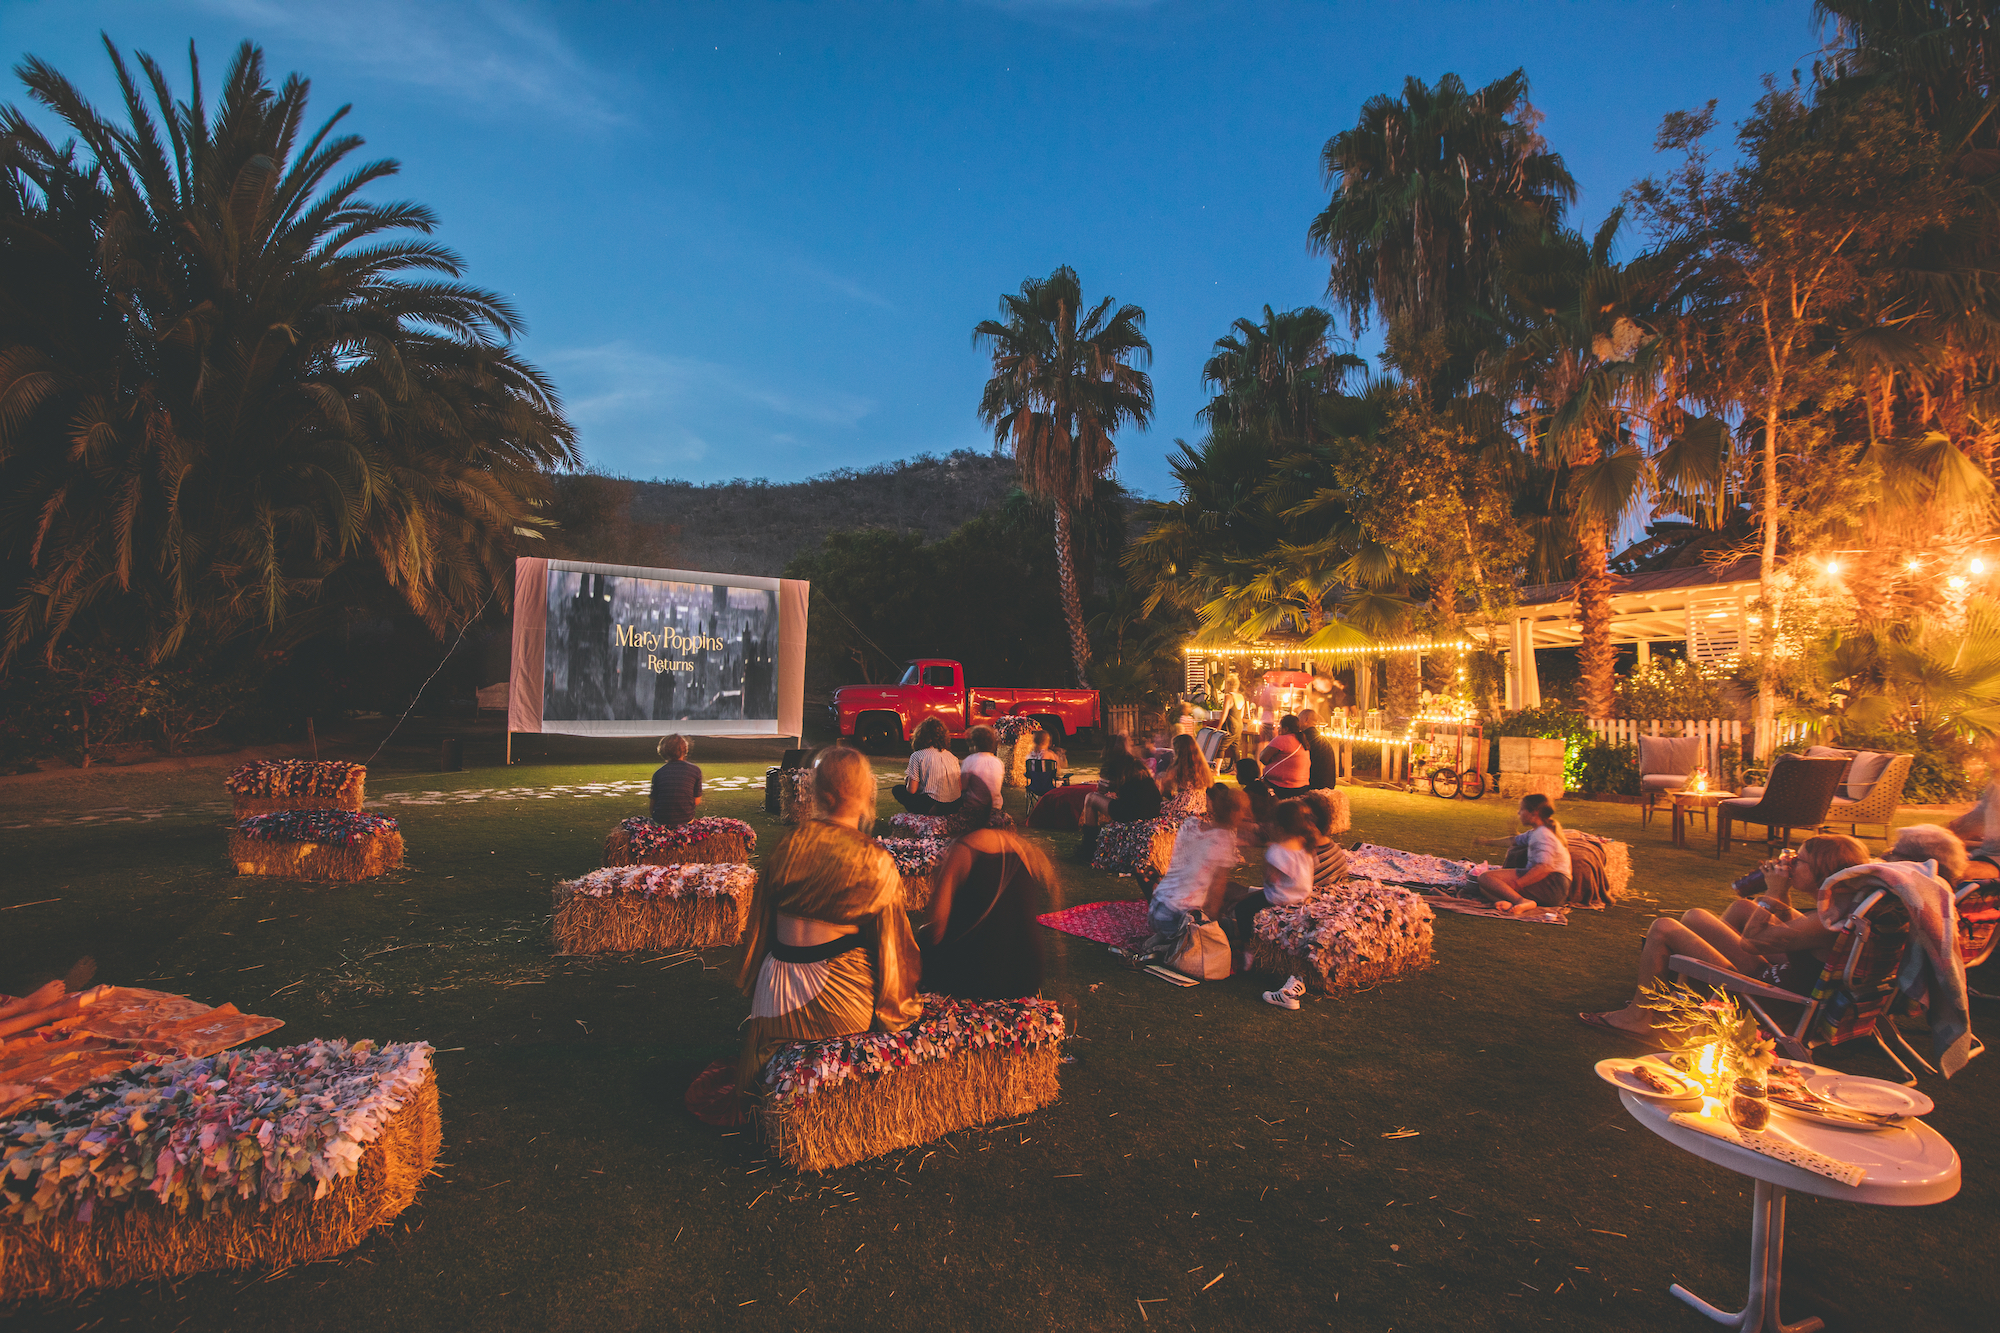 Pocahontas, Jumanji, A Bug's Life & 101 Dalmatians - Summer Movie Night